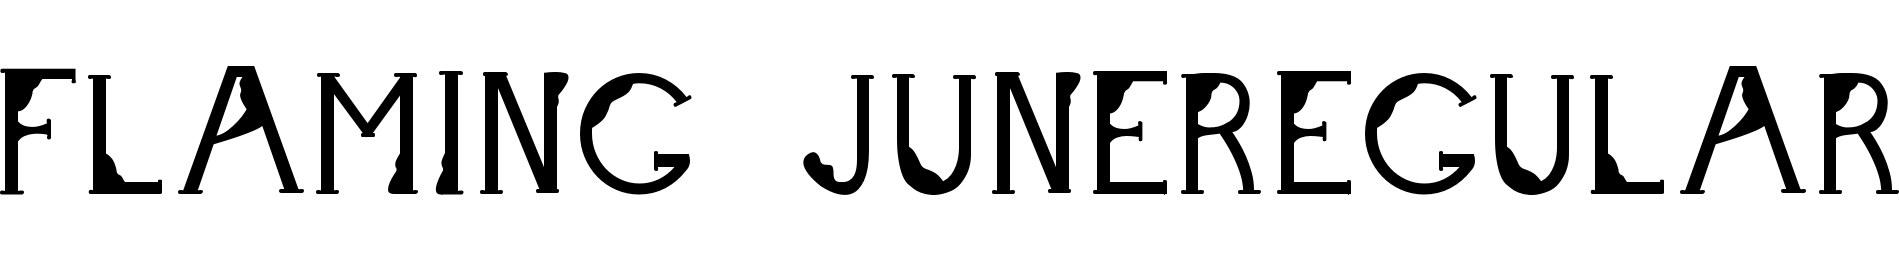 Flaming JuneRegular